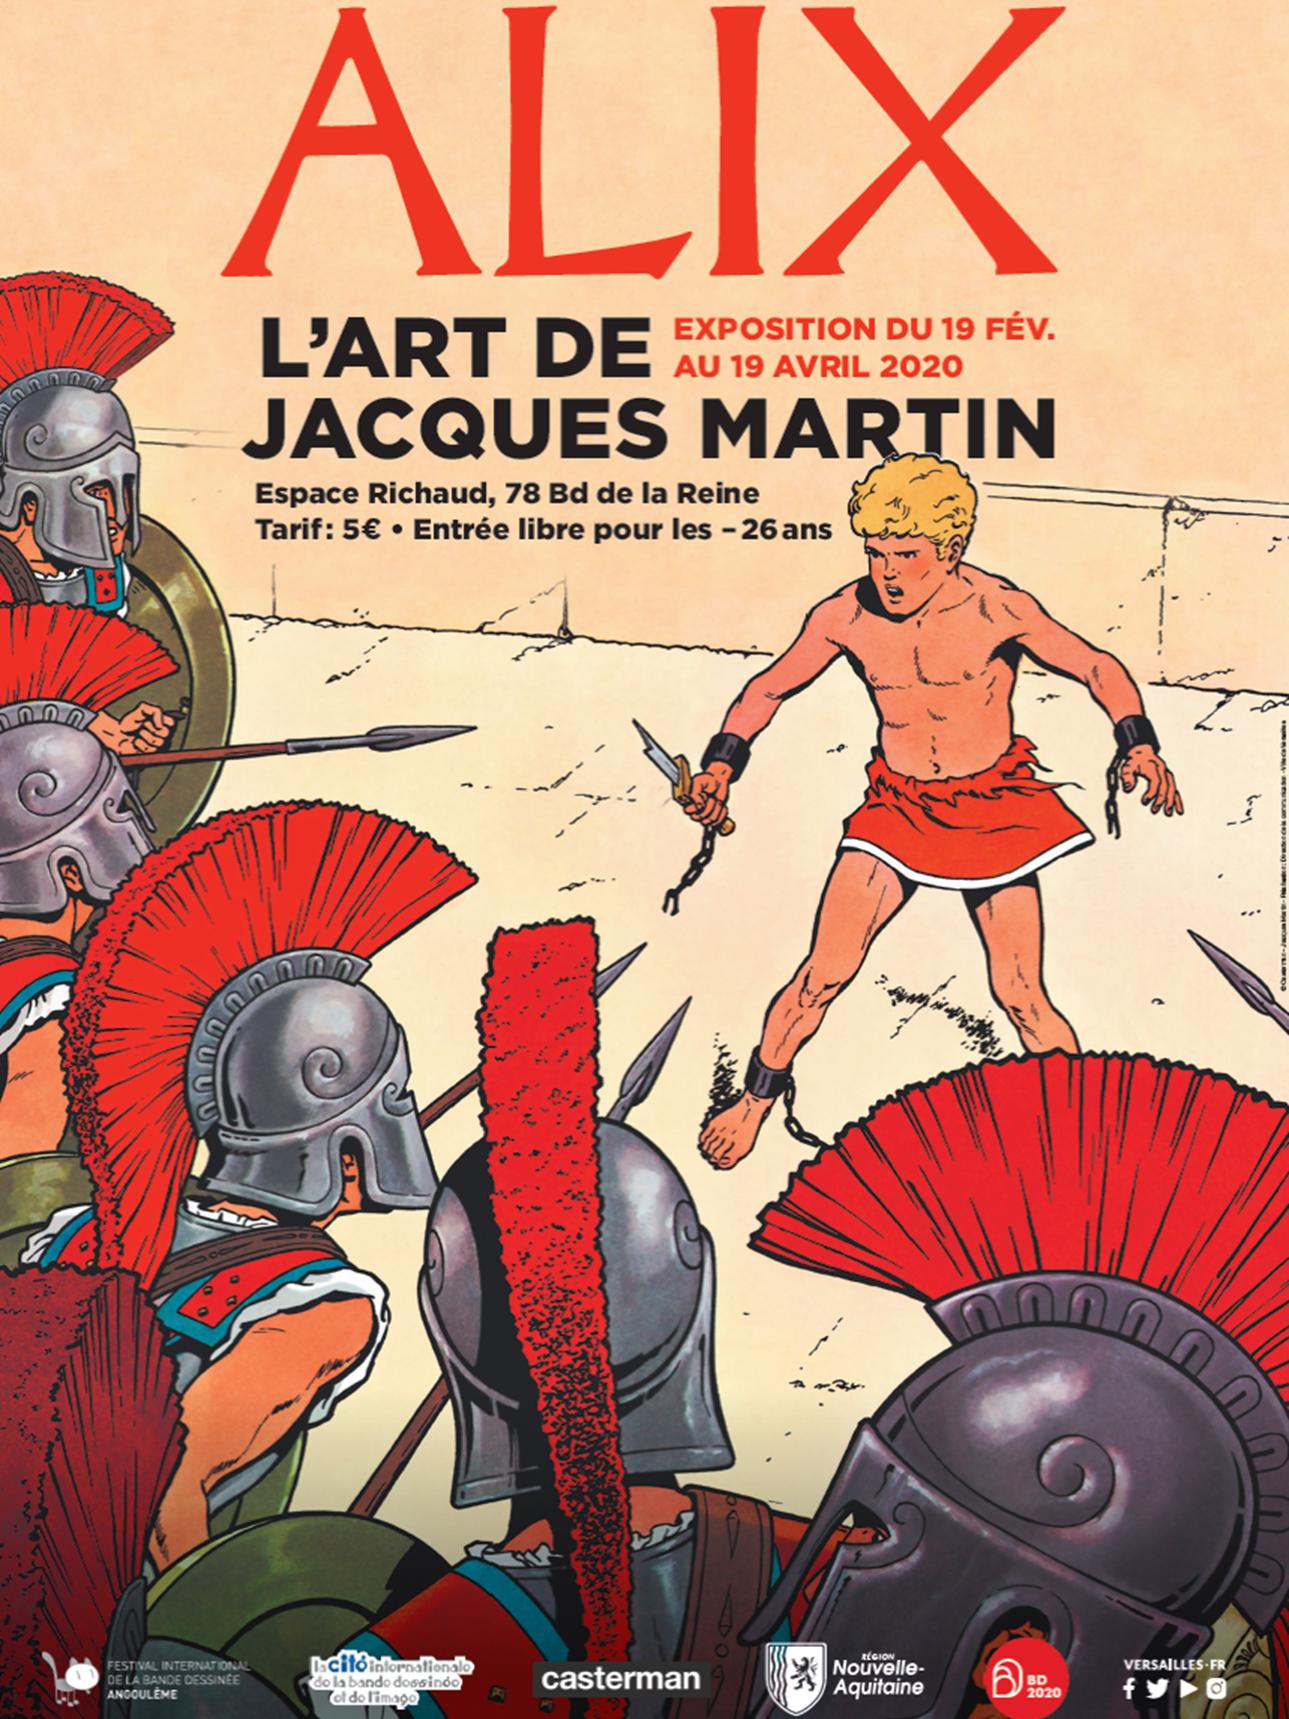 Rétrospective Alix, l'art de Jacques Martin à Versailles